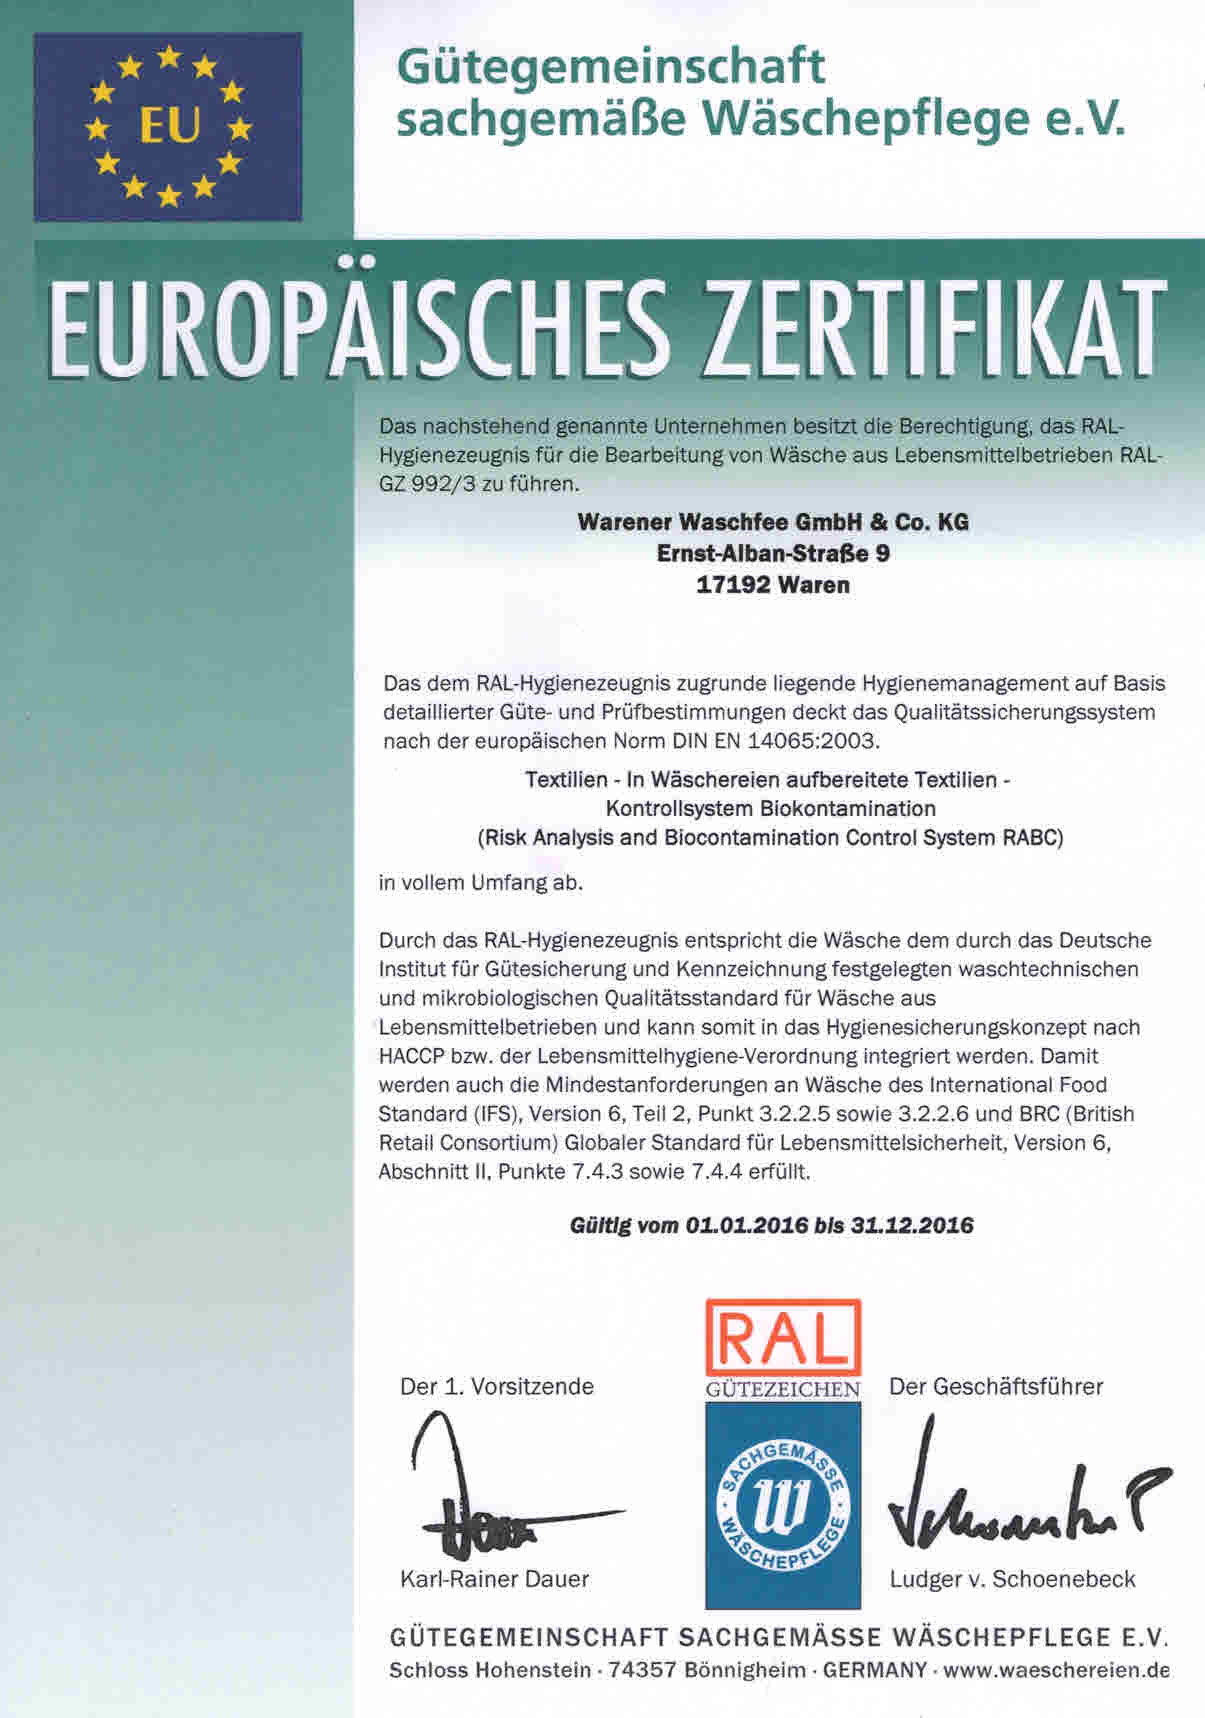 Europ_Zertifikat_GZ_992-3